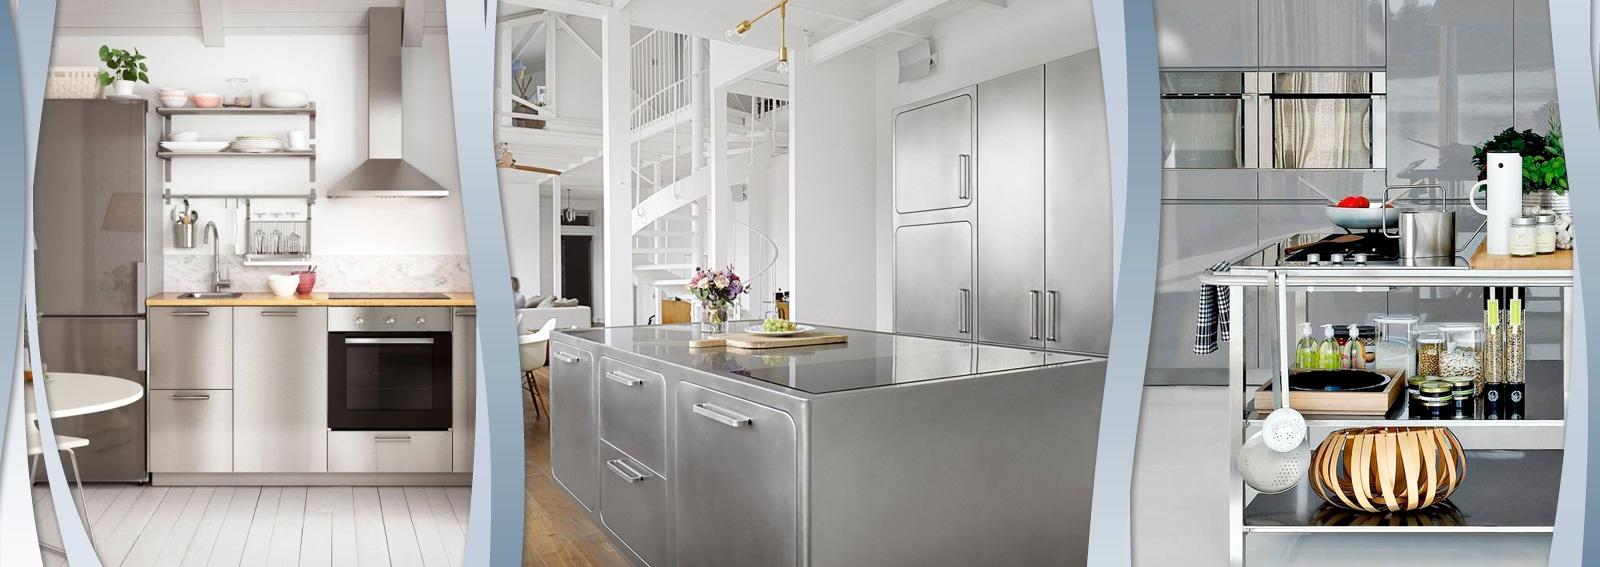 Beautiful Minicucina Ikea Varde Cucina Armadio Pictures - Home ...